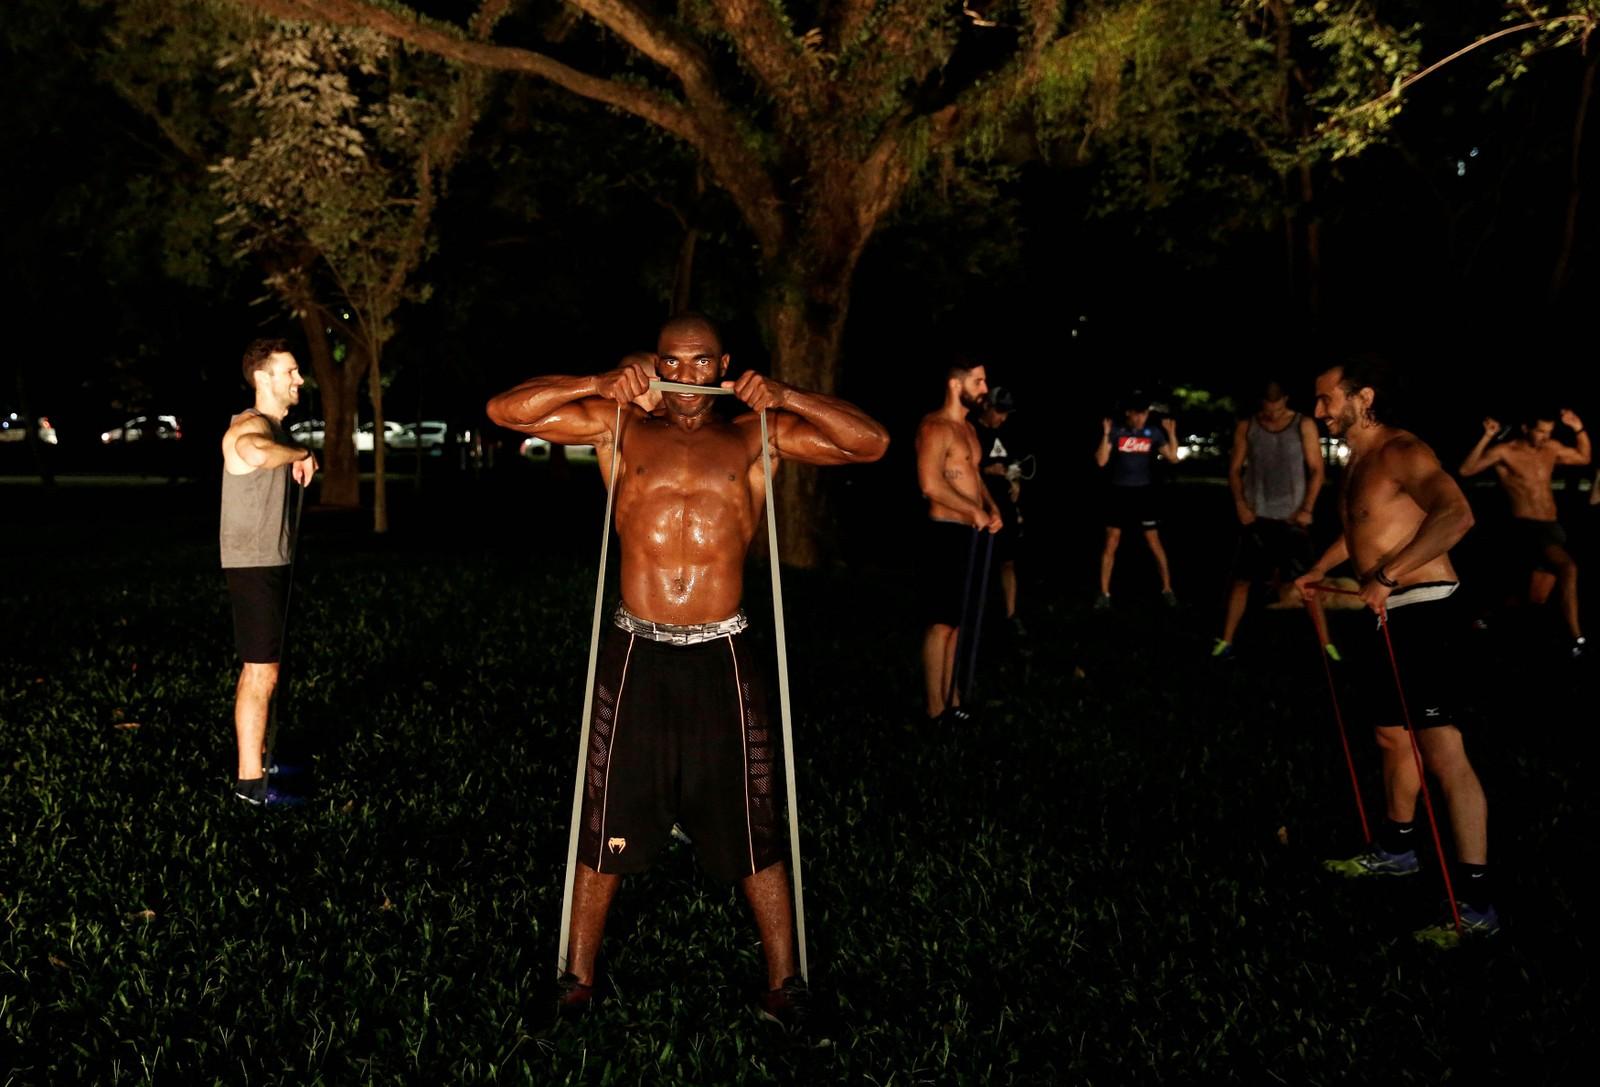 Stor treningsvilje i Ibirapuera-parken i Sao Paulo, Brasil.